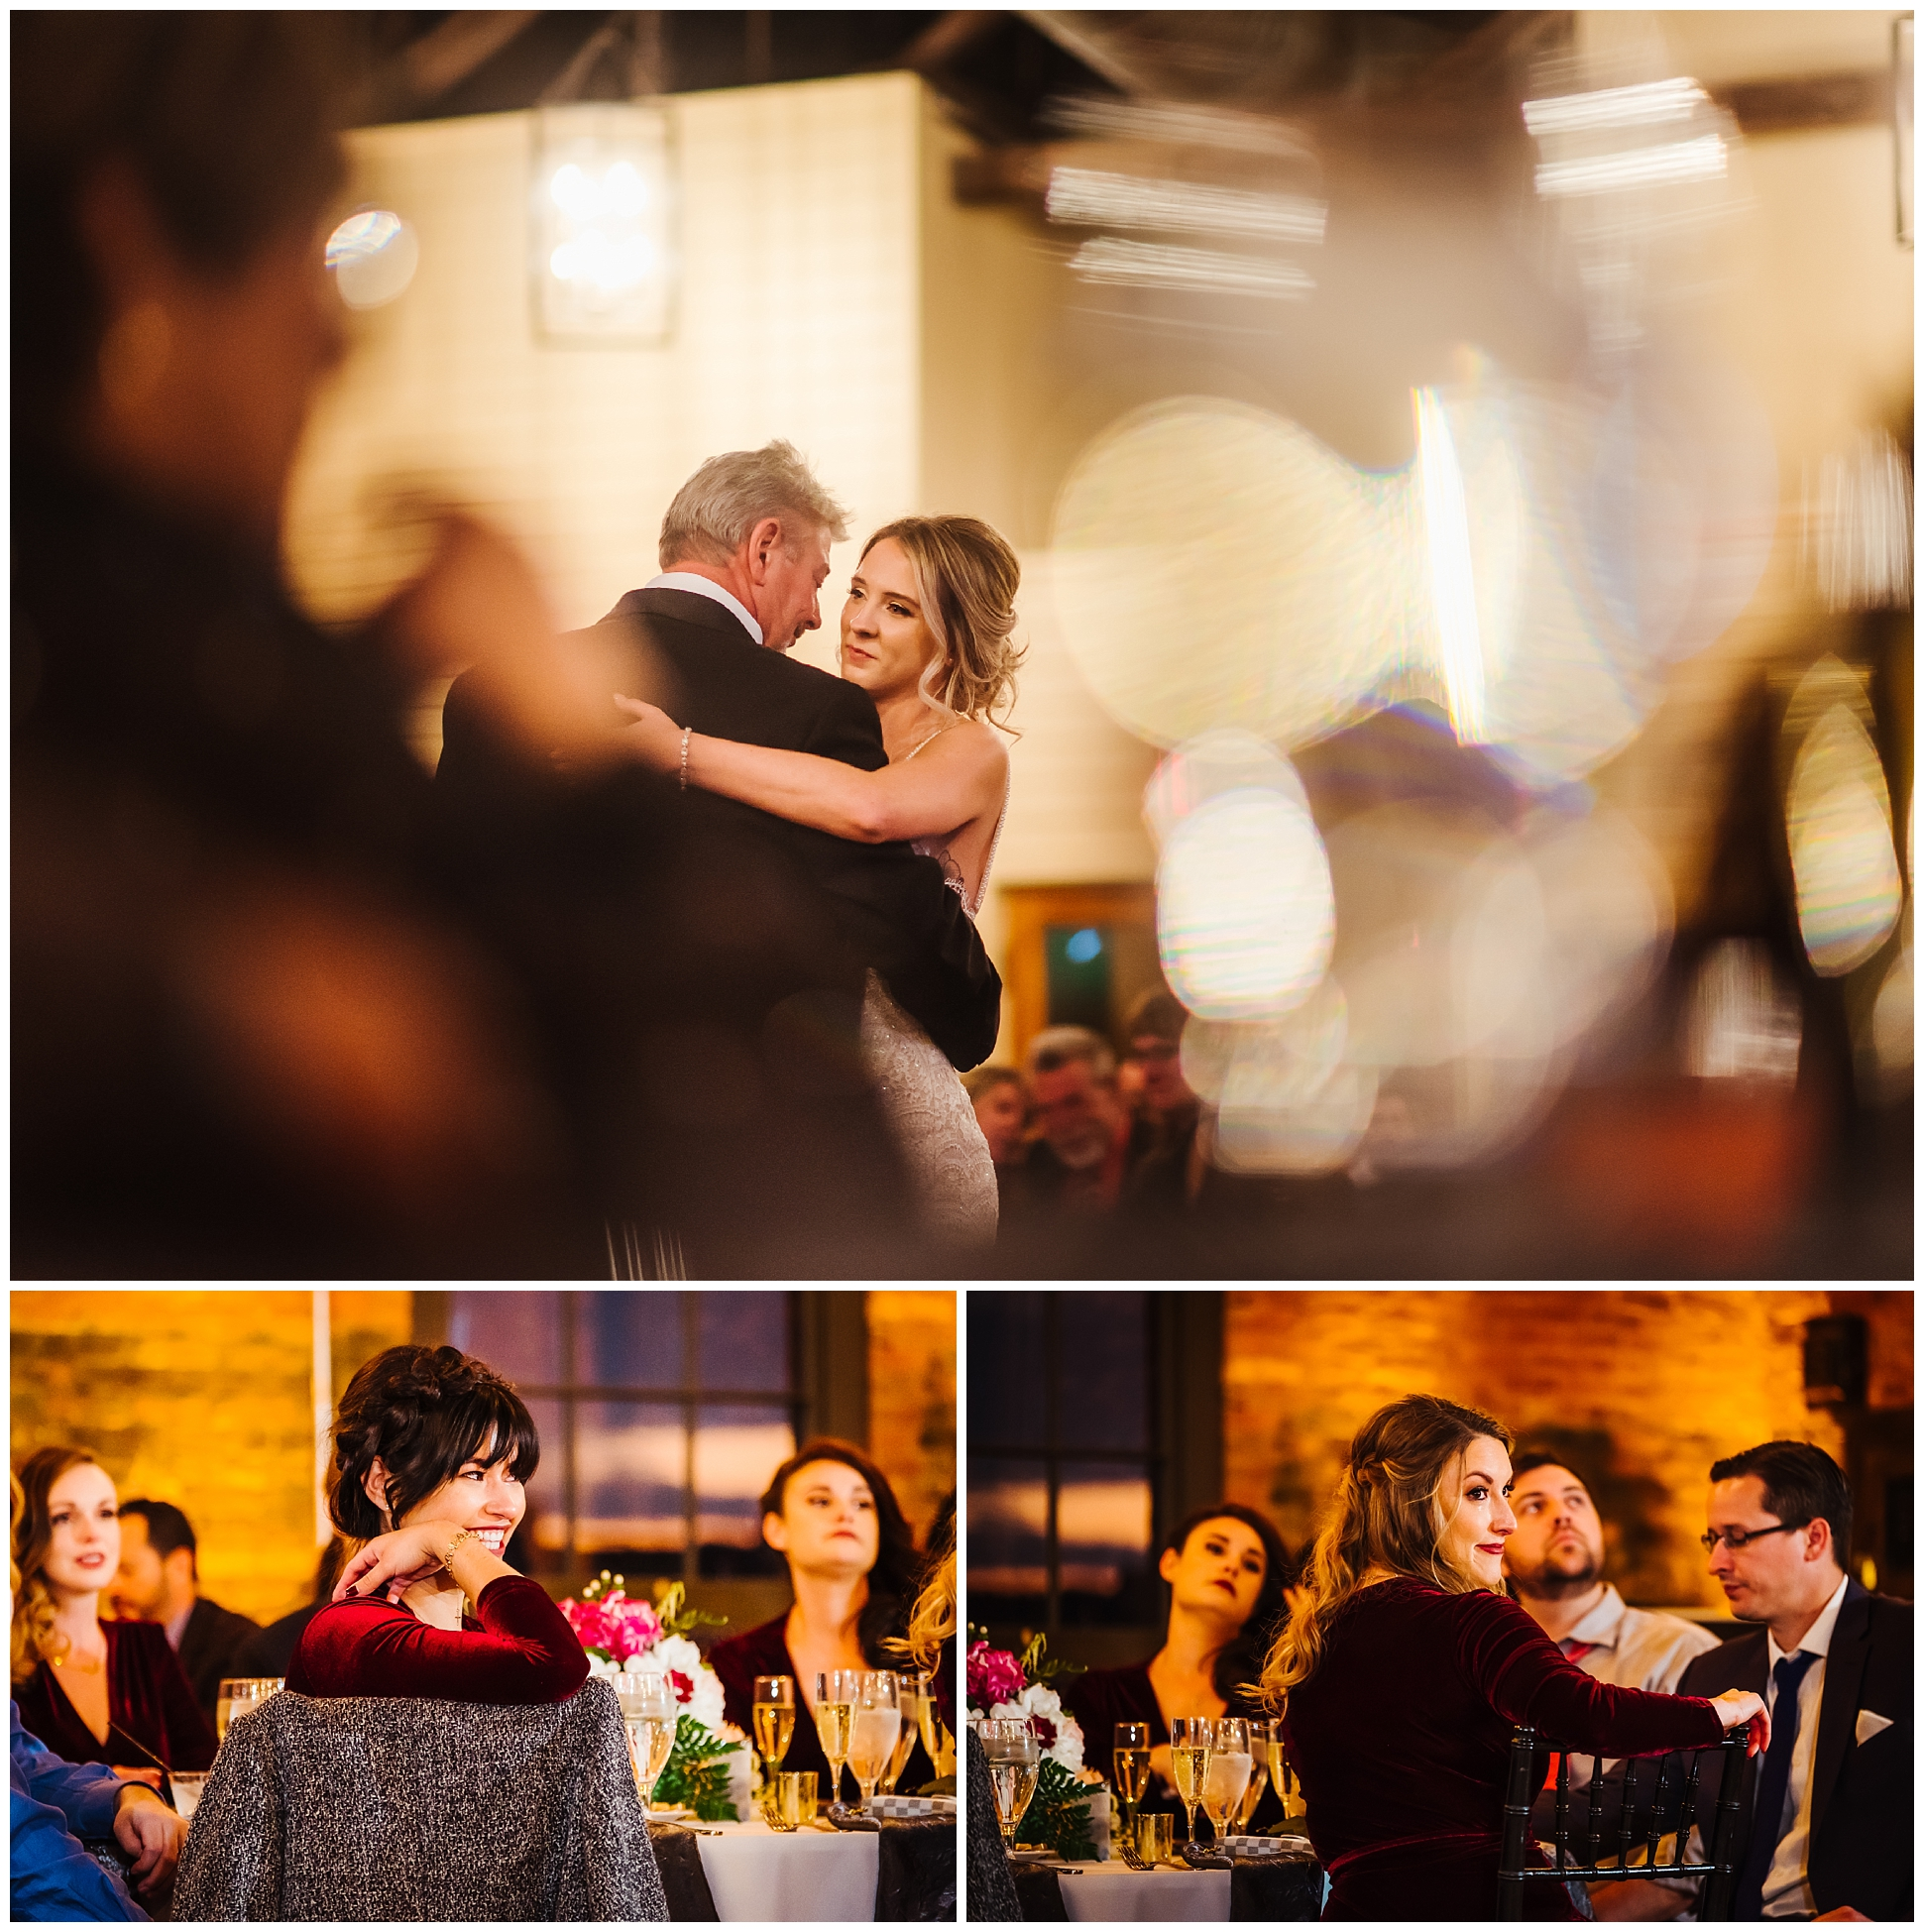 tampa-armeture-wedding-photographer-edgy-industrial-downtown-fancy-free-nursery-tattoo-burgandy-velvet_0074.jpg